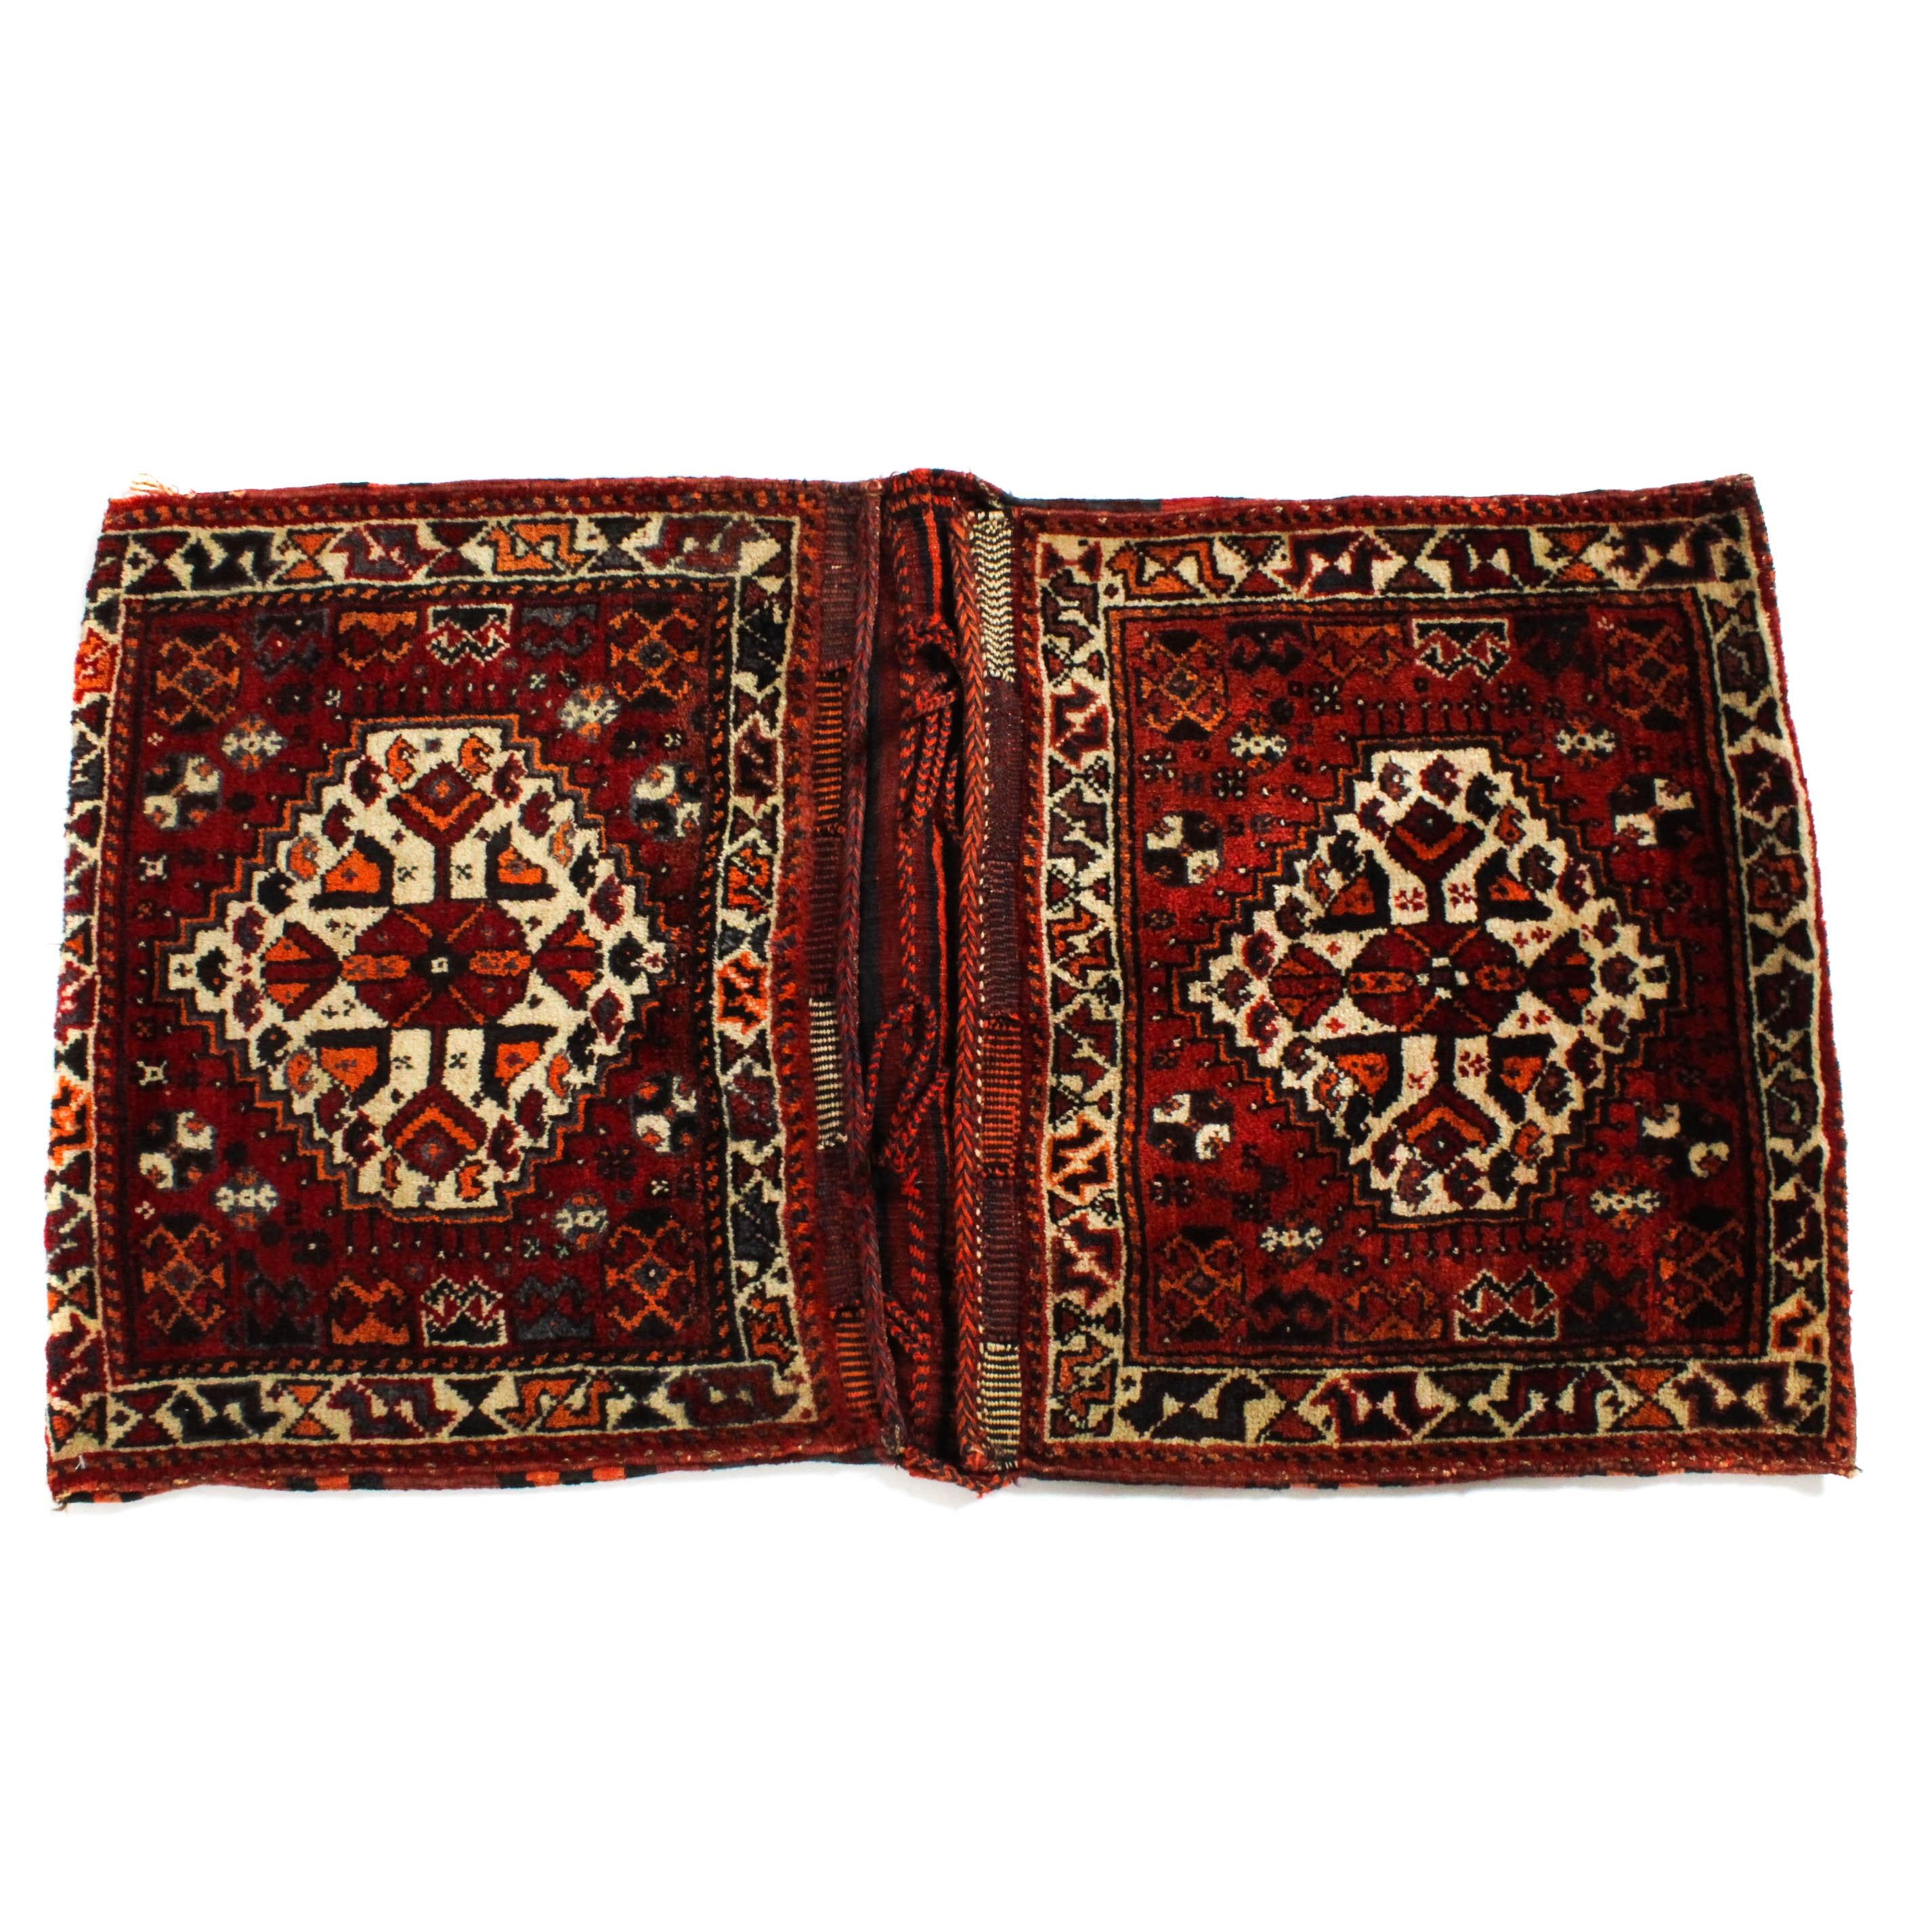 2'3 x 4'1 Semi-Antique Hand-Knotted Persian Varamin Saddlebag